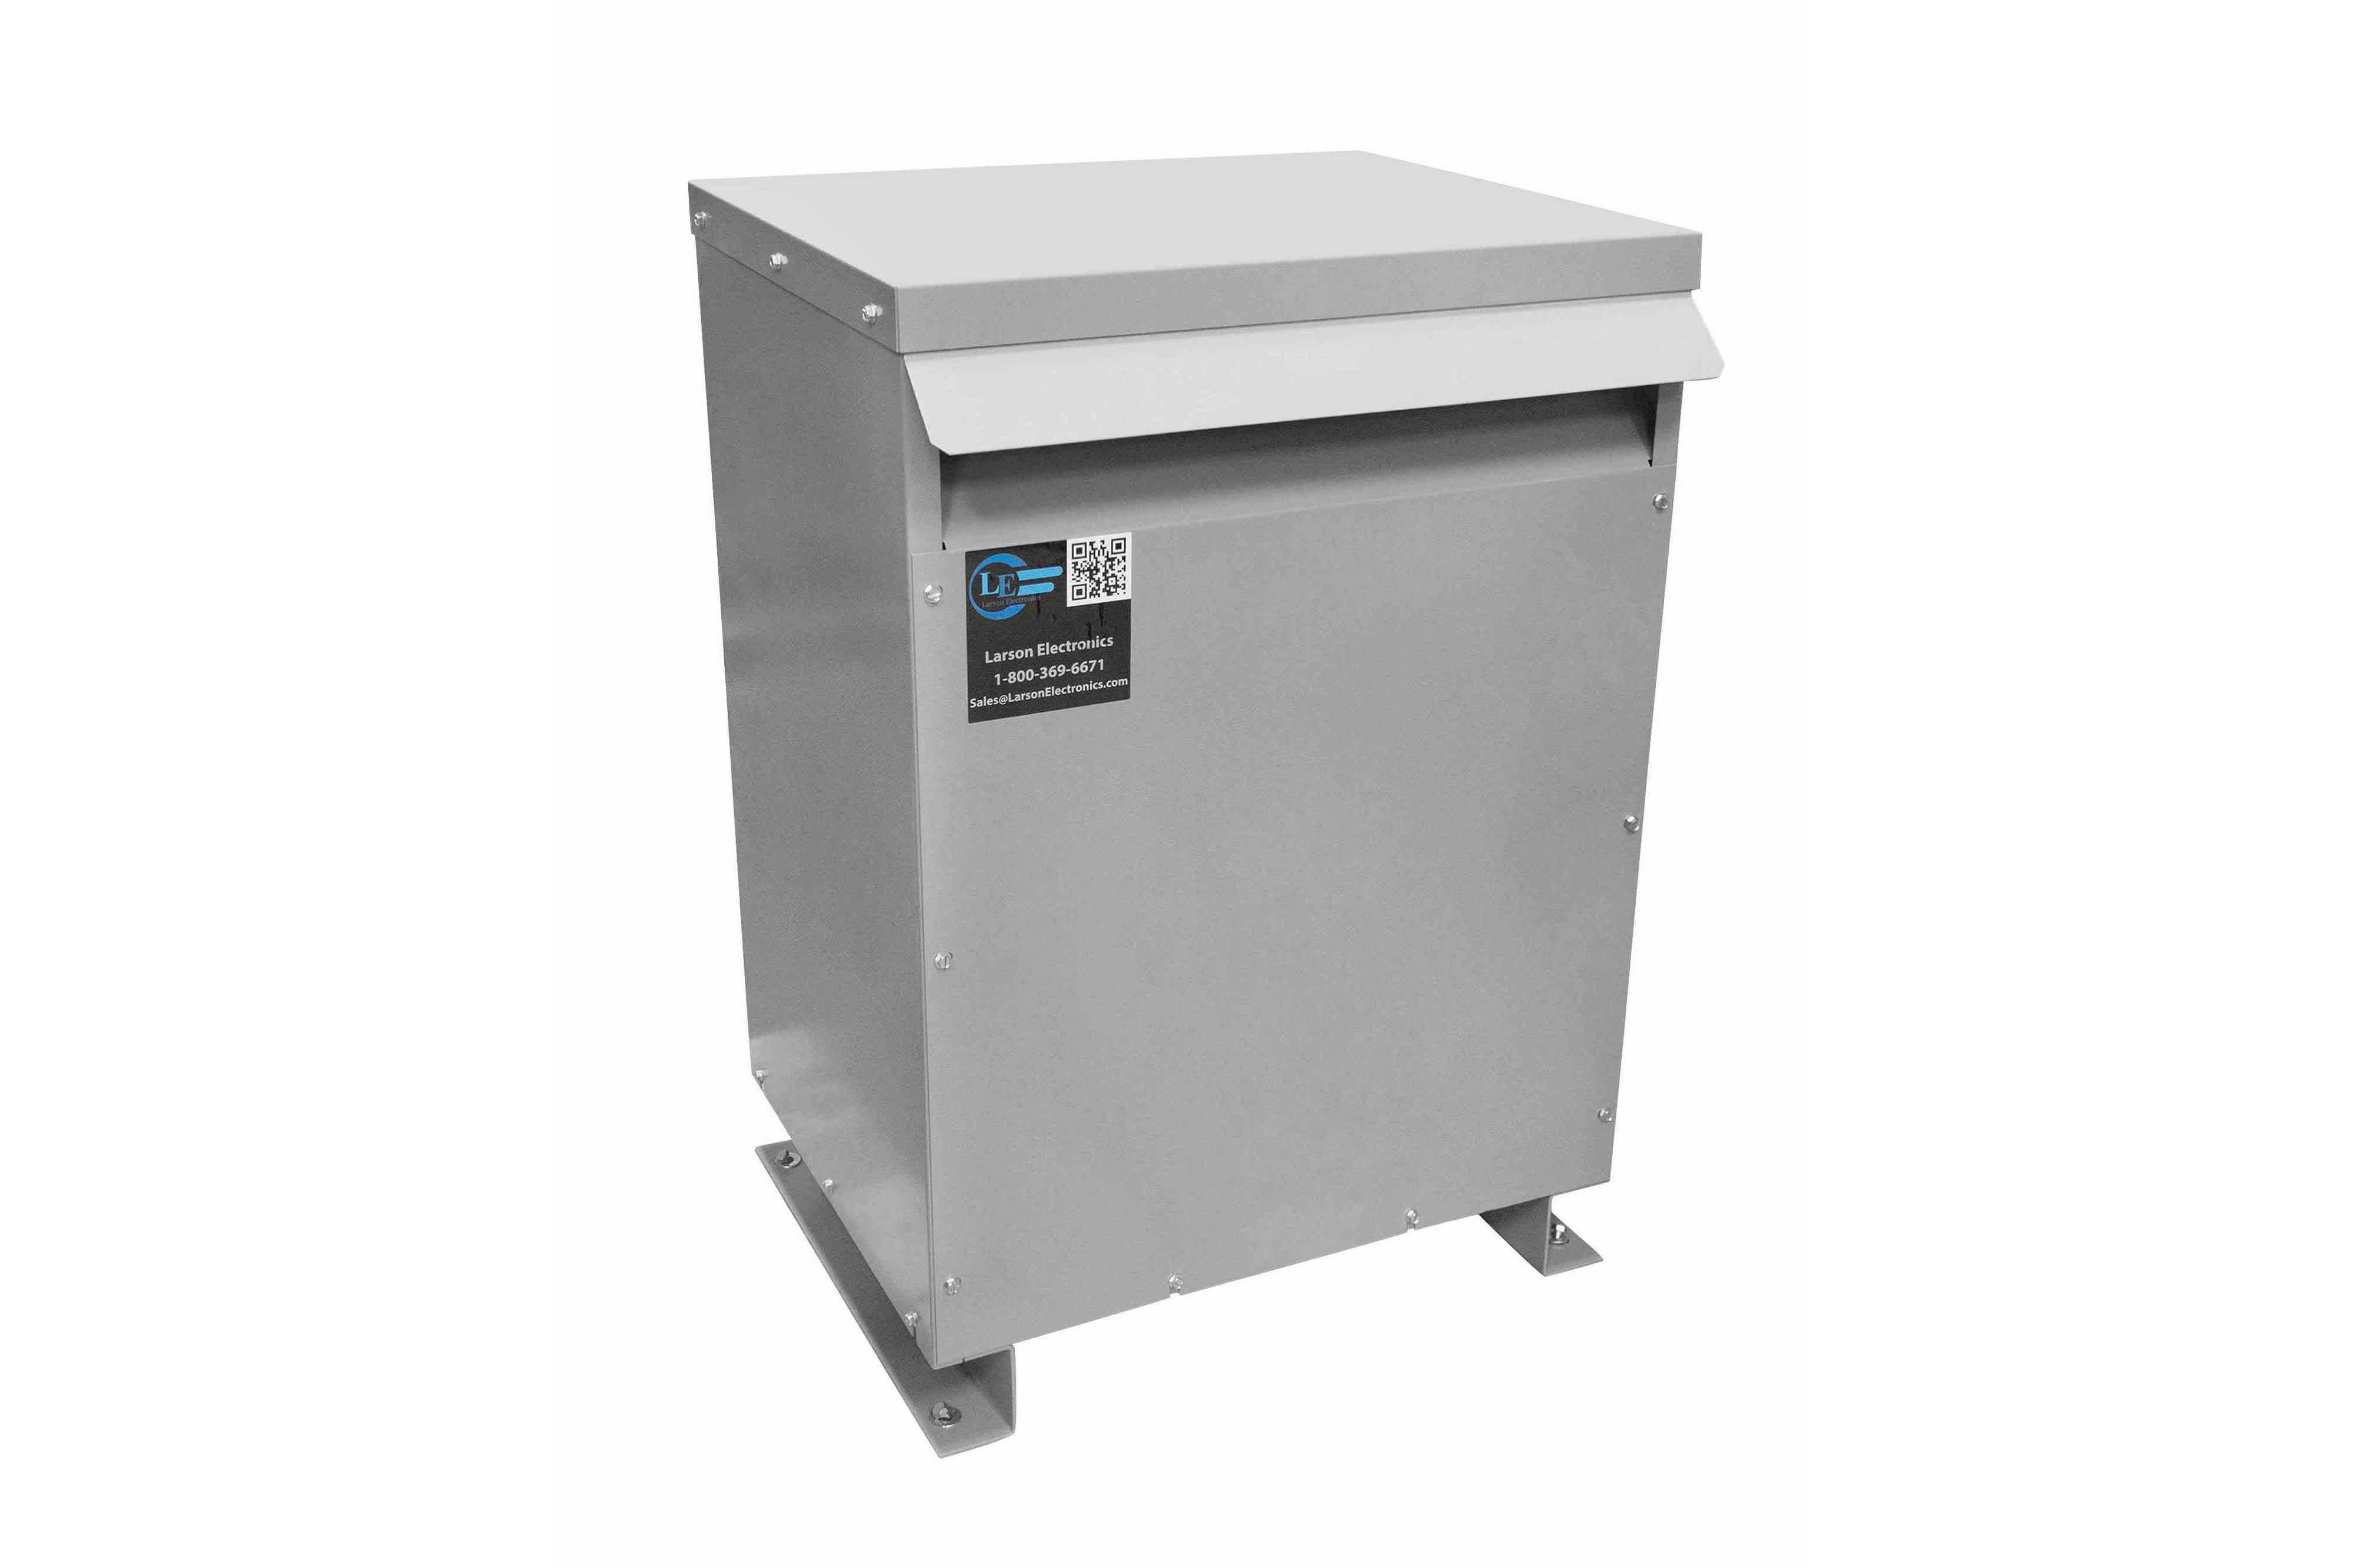 75 kVA 3PH Isolation Transformer, 460V Wye Primary, 415Y/240 Wye-N Secondary, N3R, Ventilated, 60 Hz